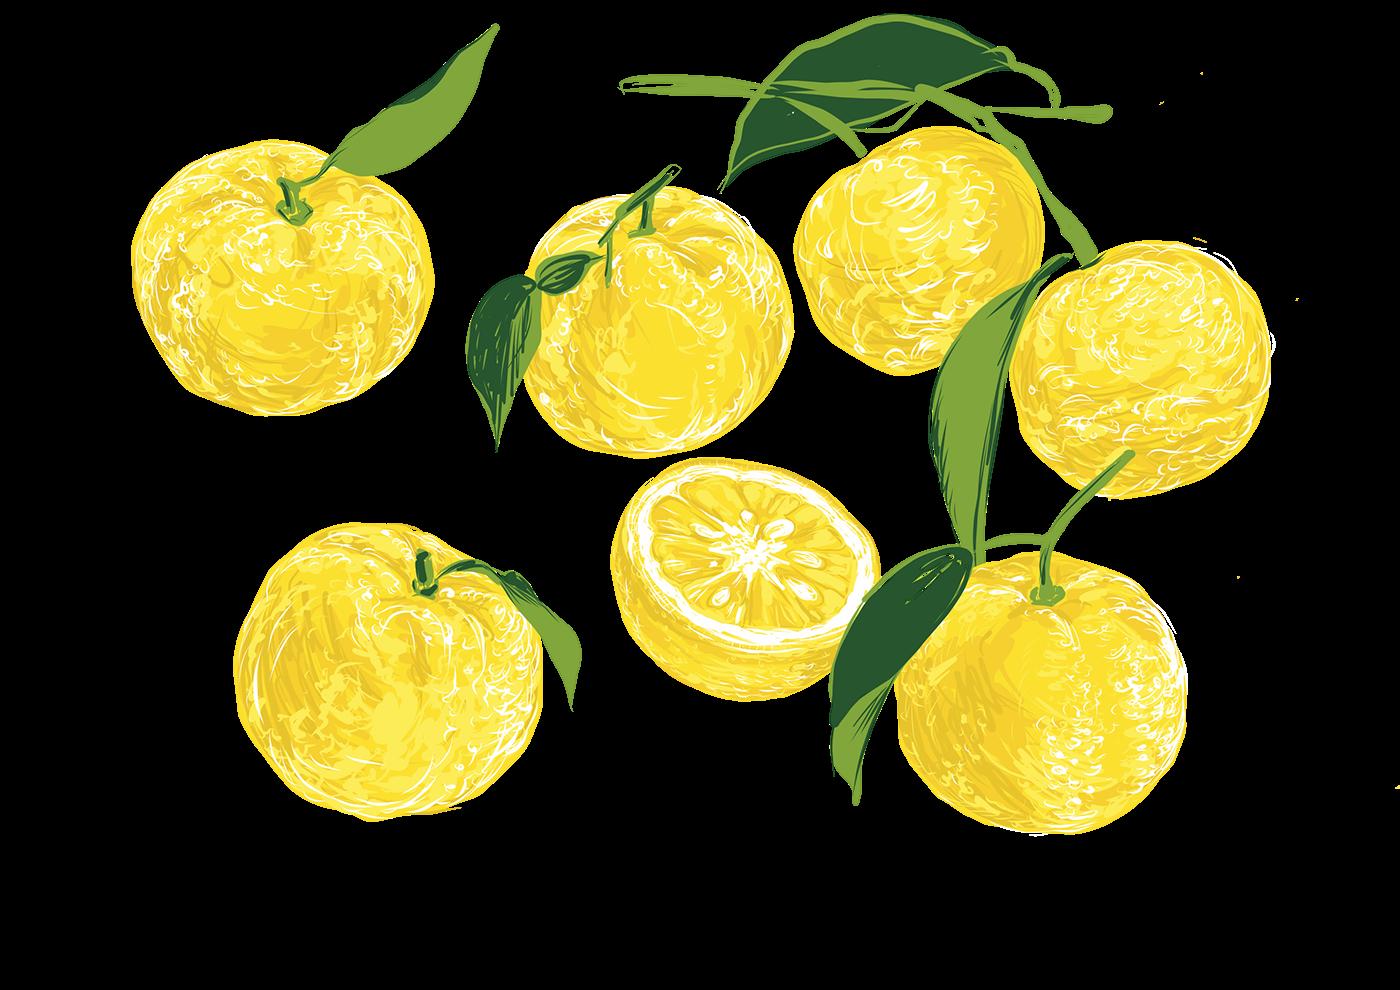 svg black and white download Lemon cake on Behance